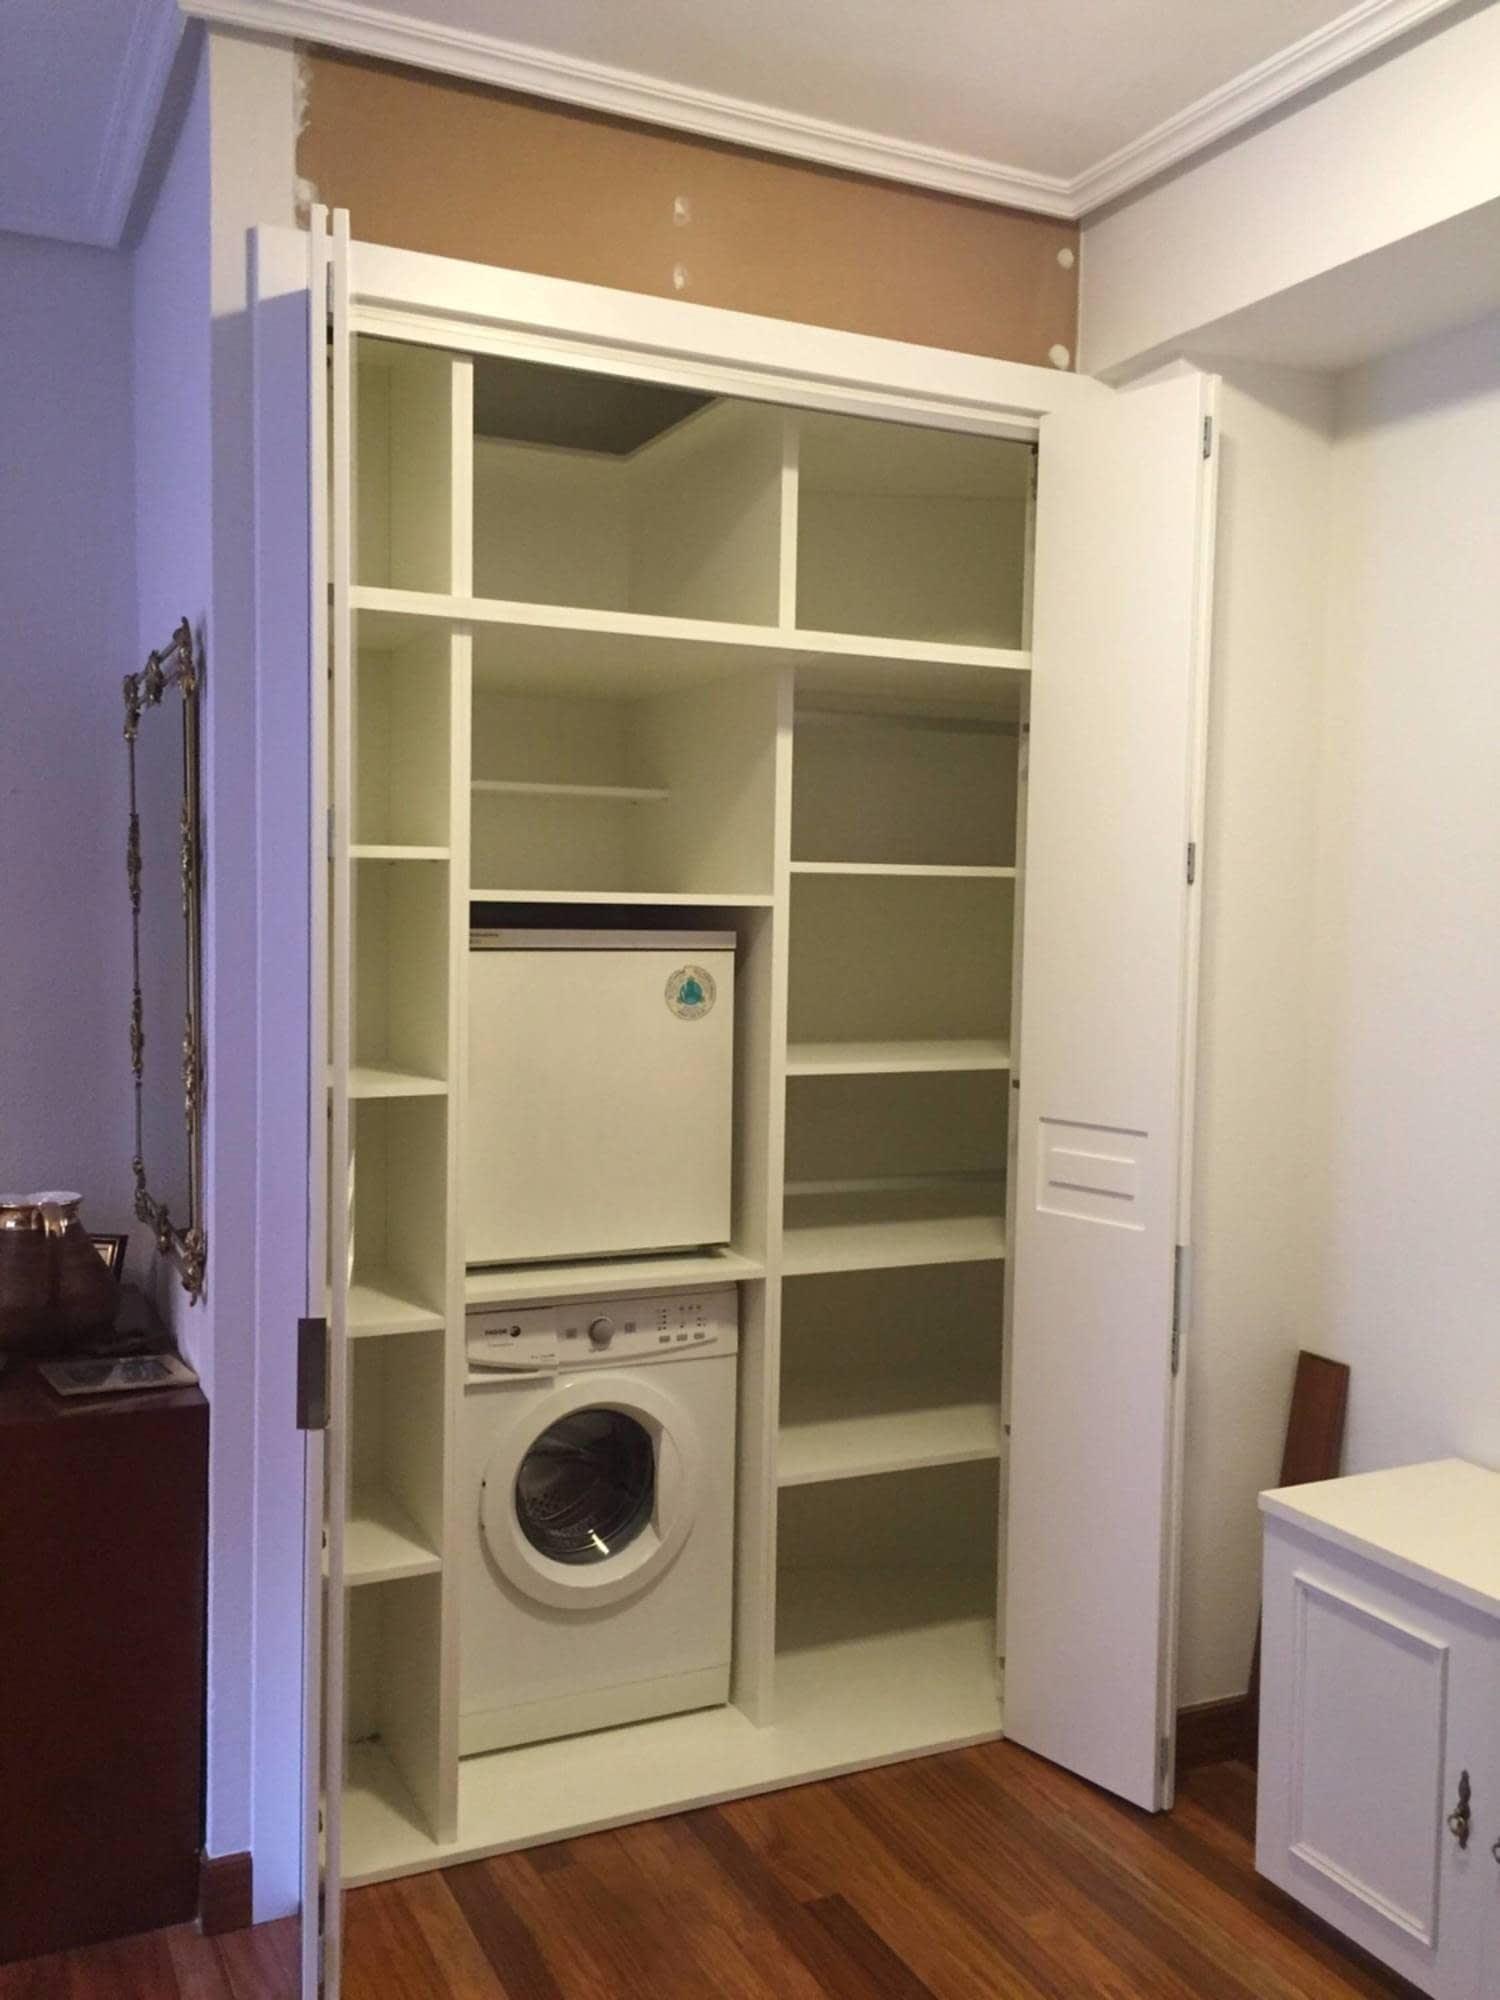 Muebles para lavadora exterior mueble para lavadora - Armario lavadora exterior ...